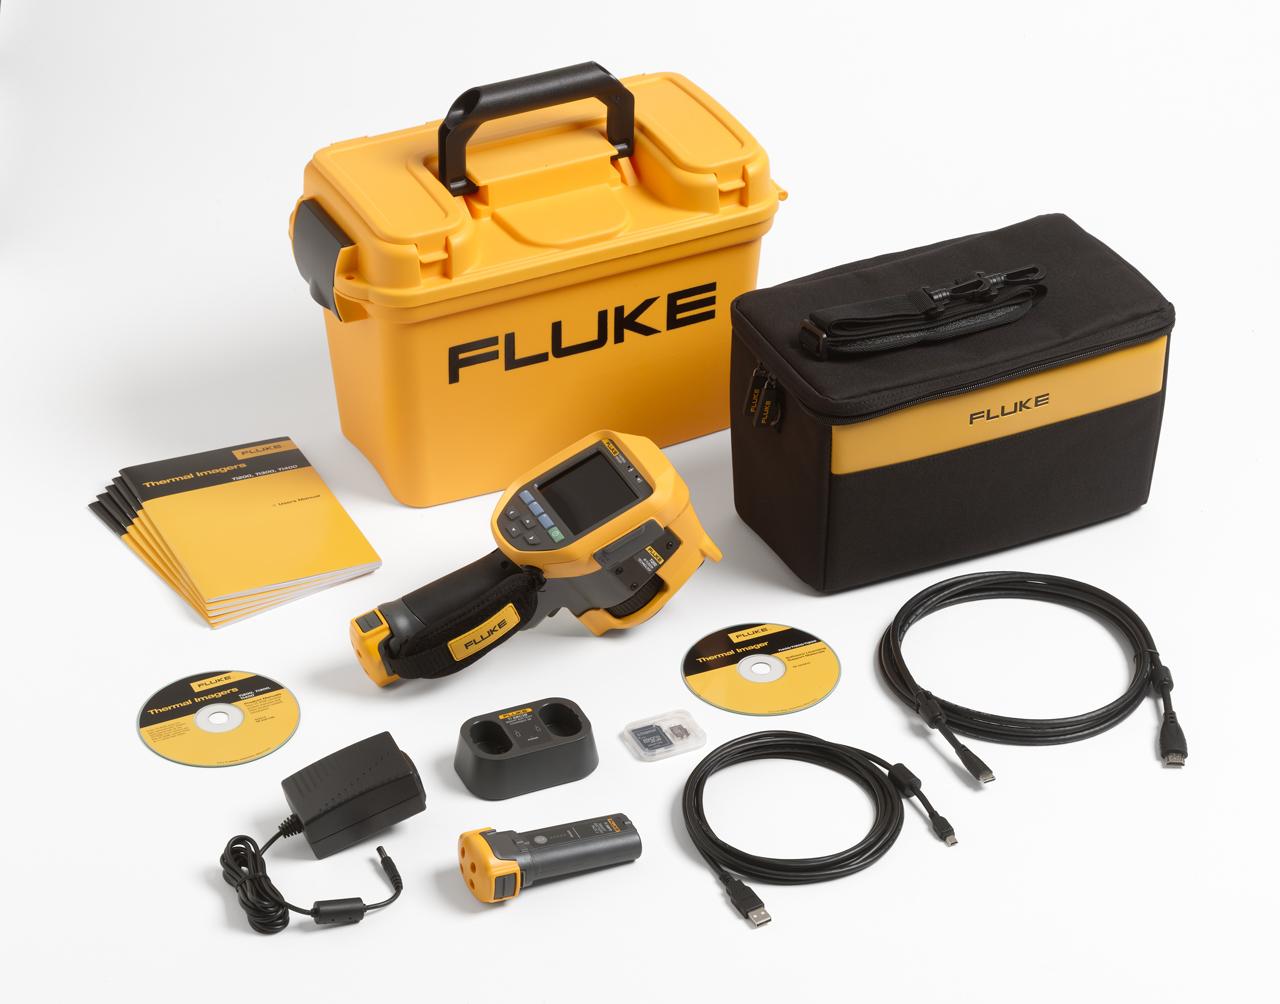 FLUKE Ti200 9Hz - Thermal Imager; 9Hz / 2.09 mRad / 200 x 150 pixels